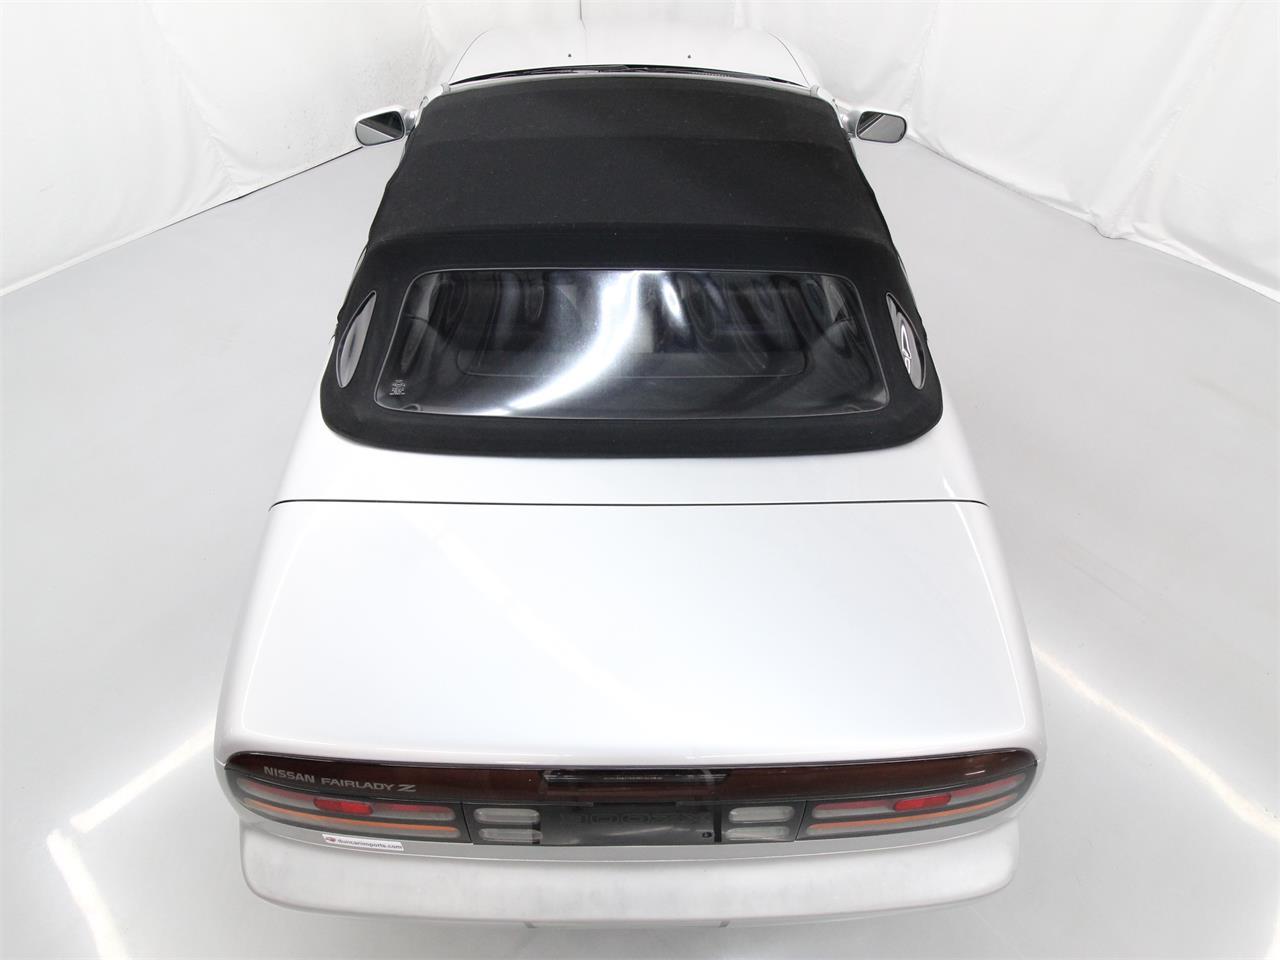 1992 Nissan Fairlady (CC-1315692) for sale in Christiansburg, Virginia